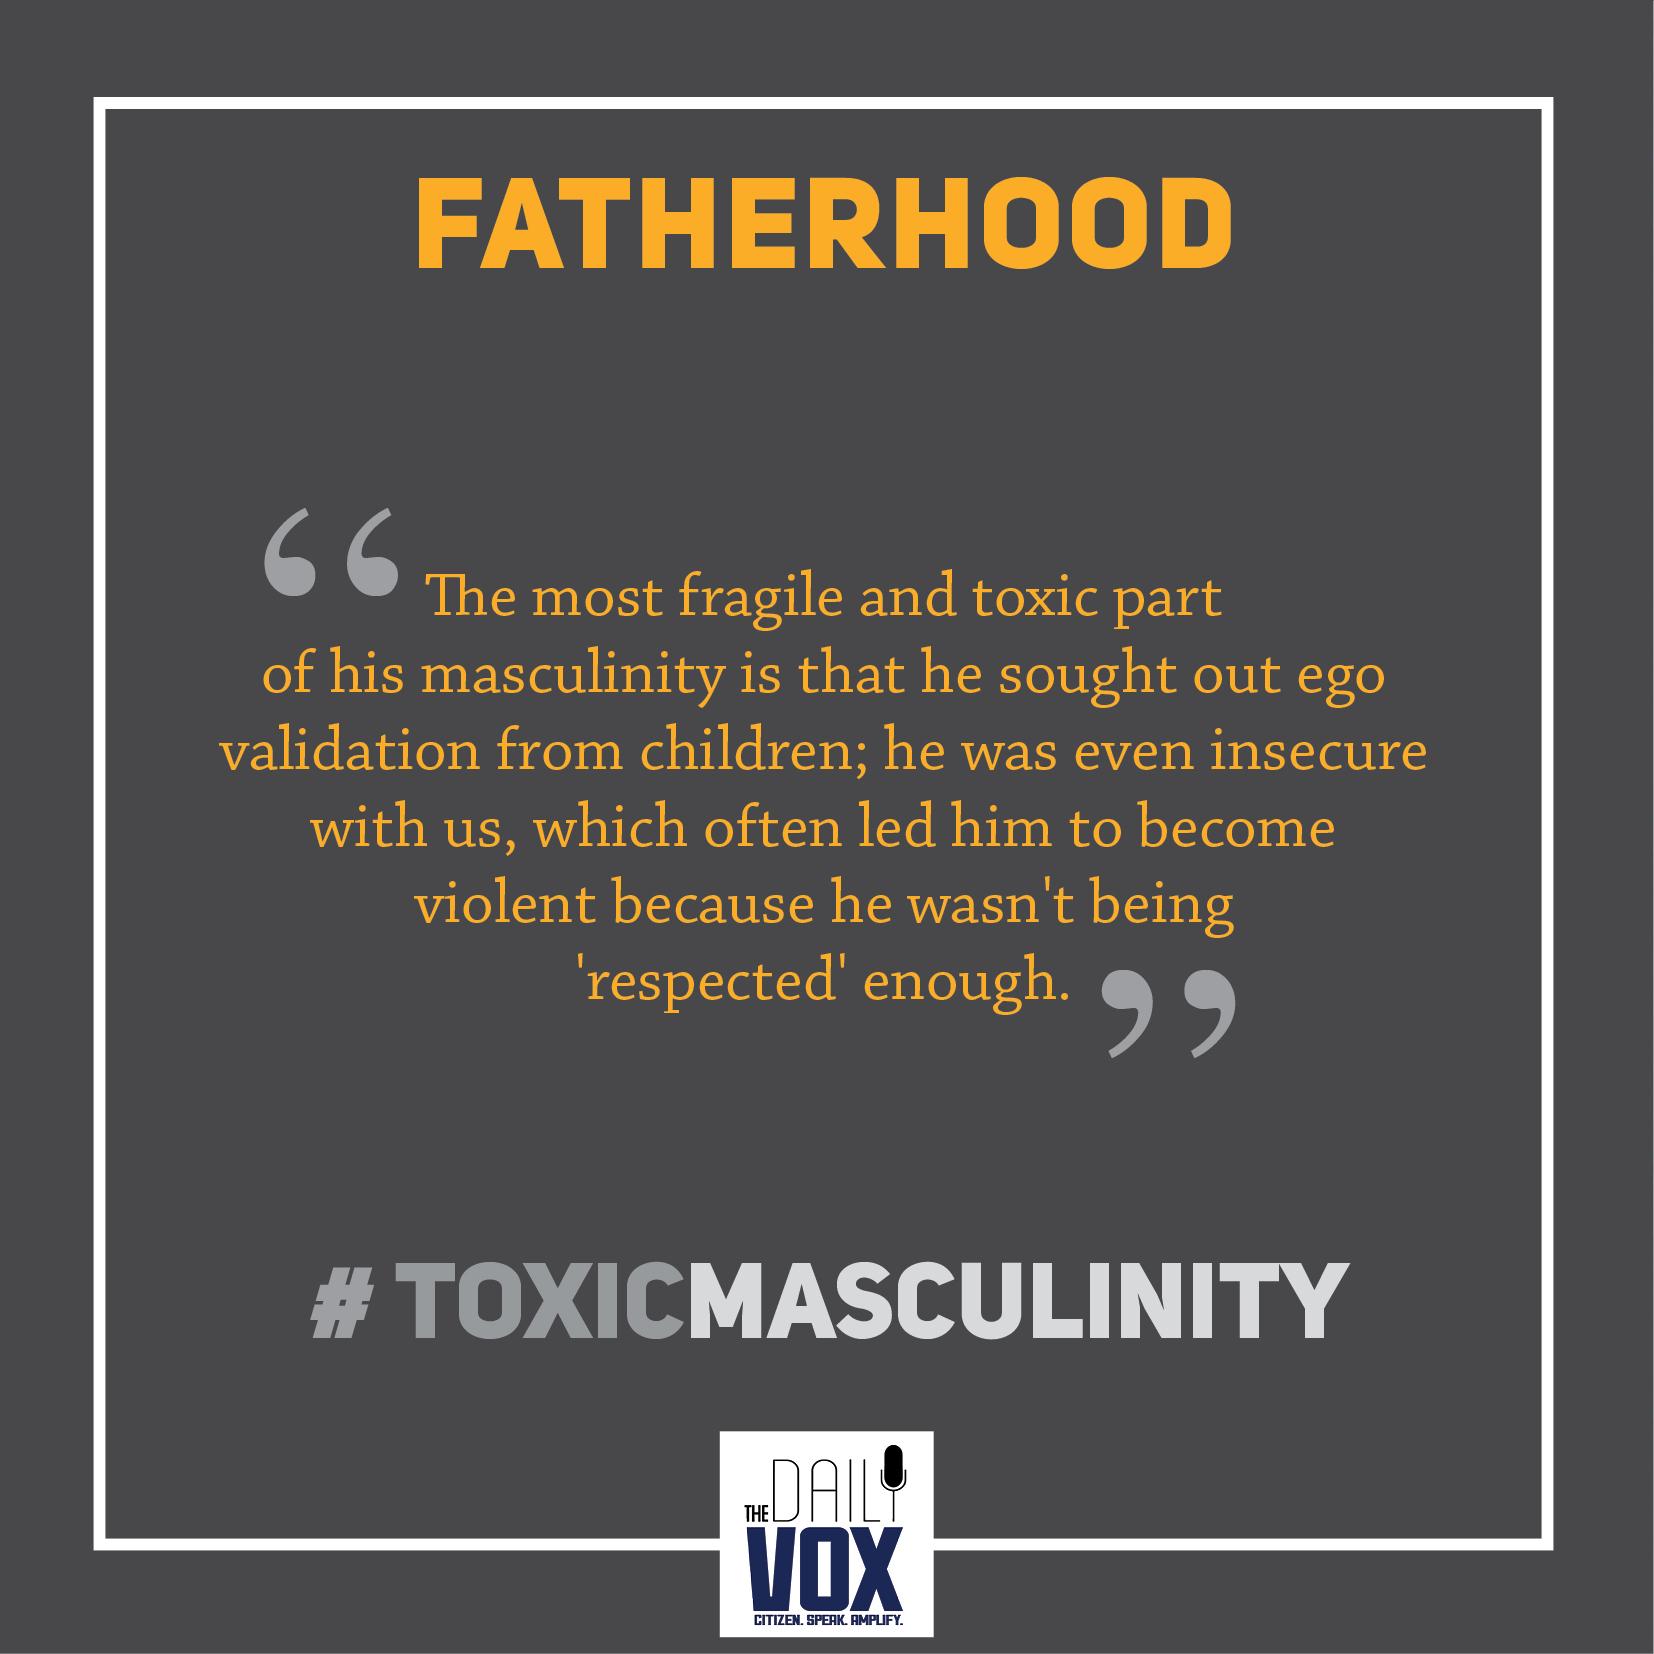 toxic masculinity SMC fatherhood sexism